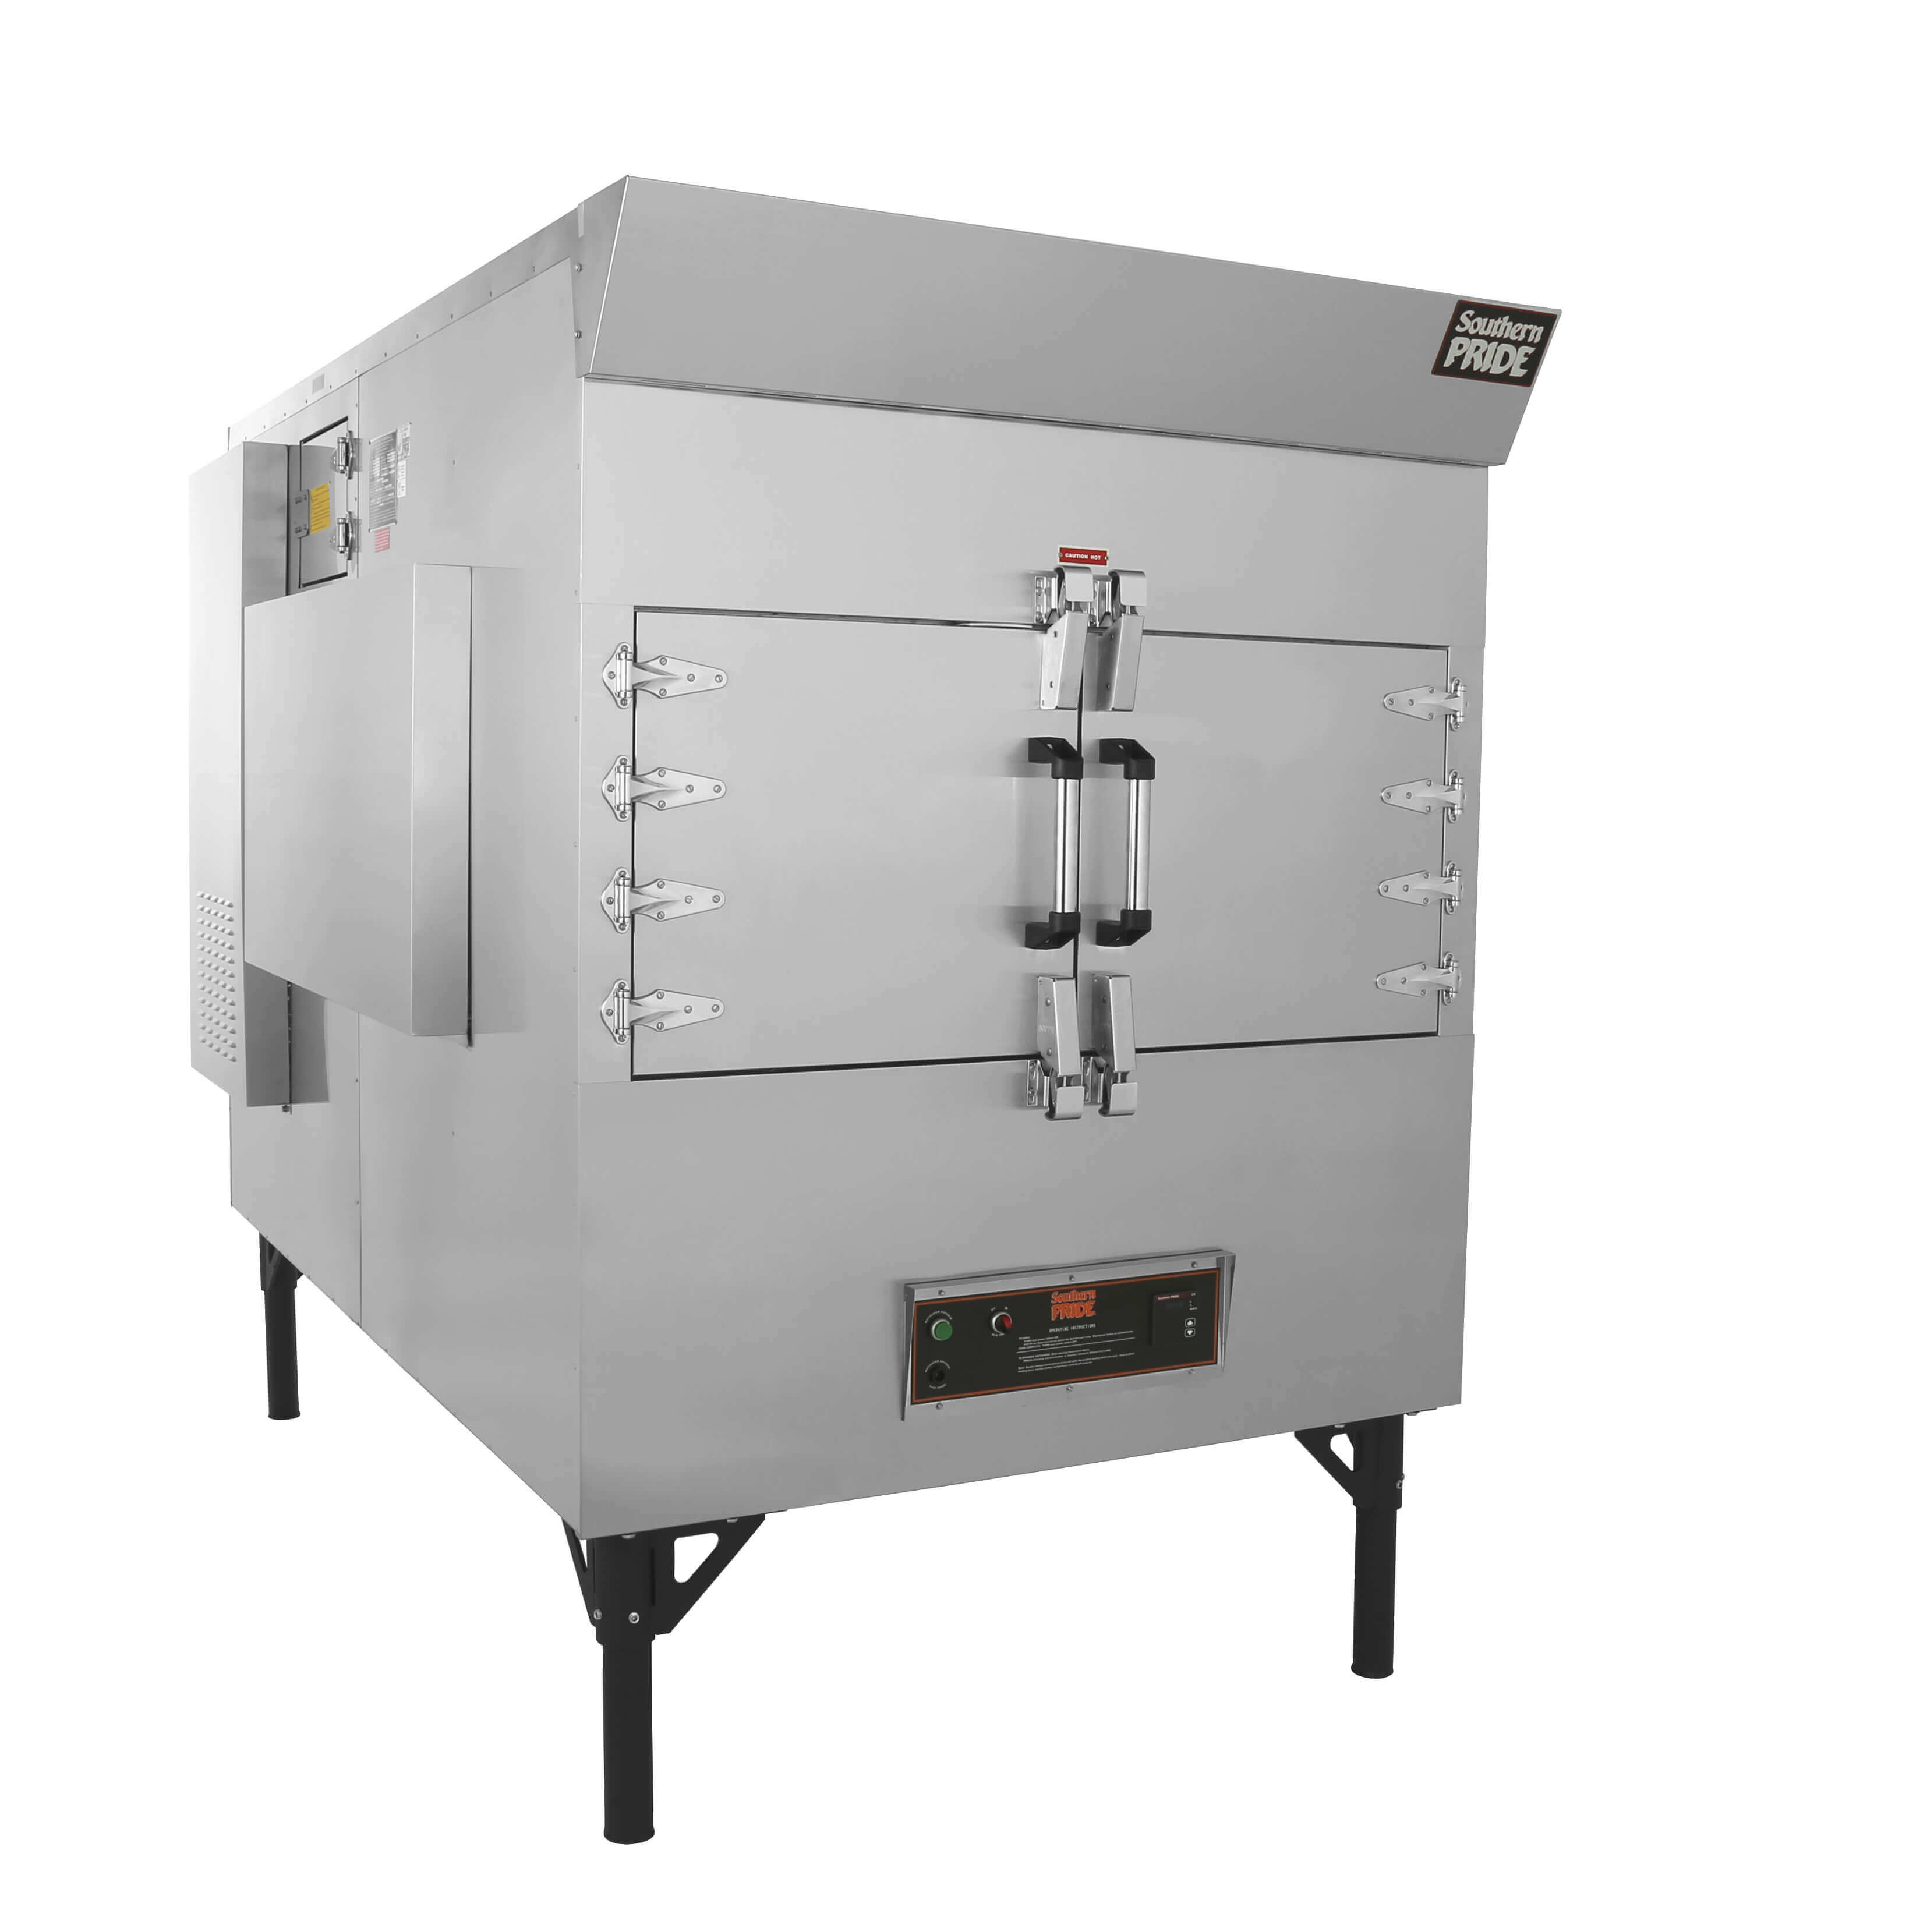 SPK-1000